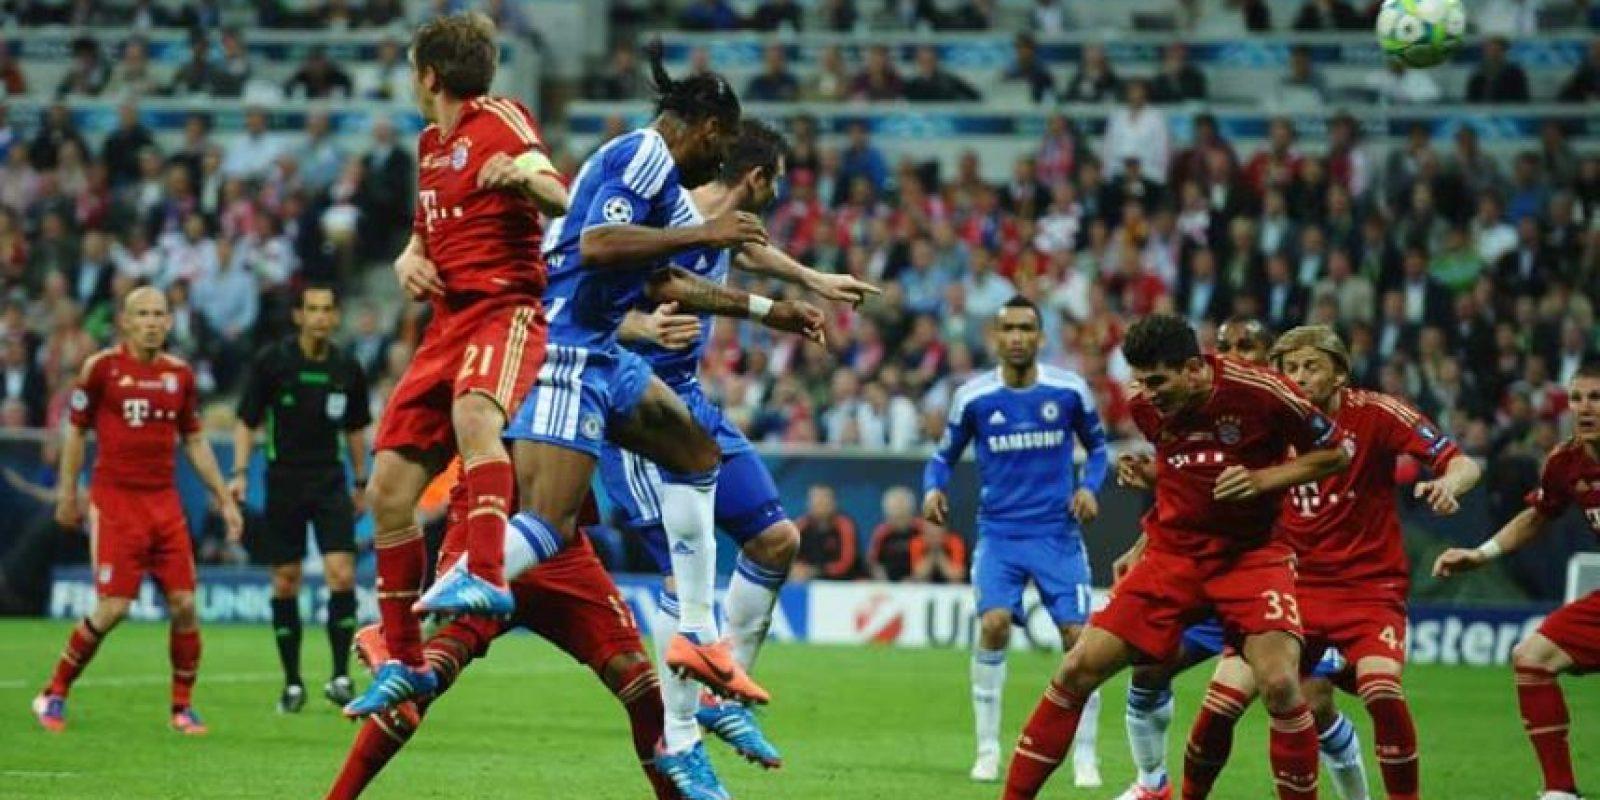 2012: Bayern Munich vs. Chelsea Foto:Getty Images